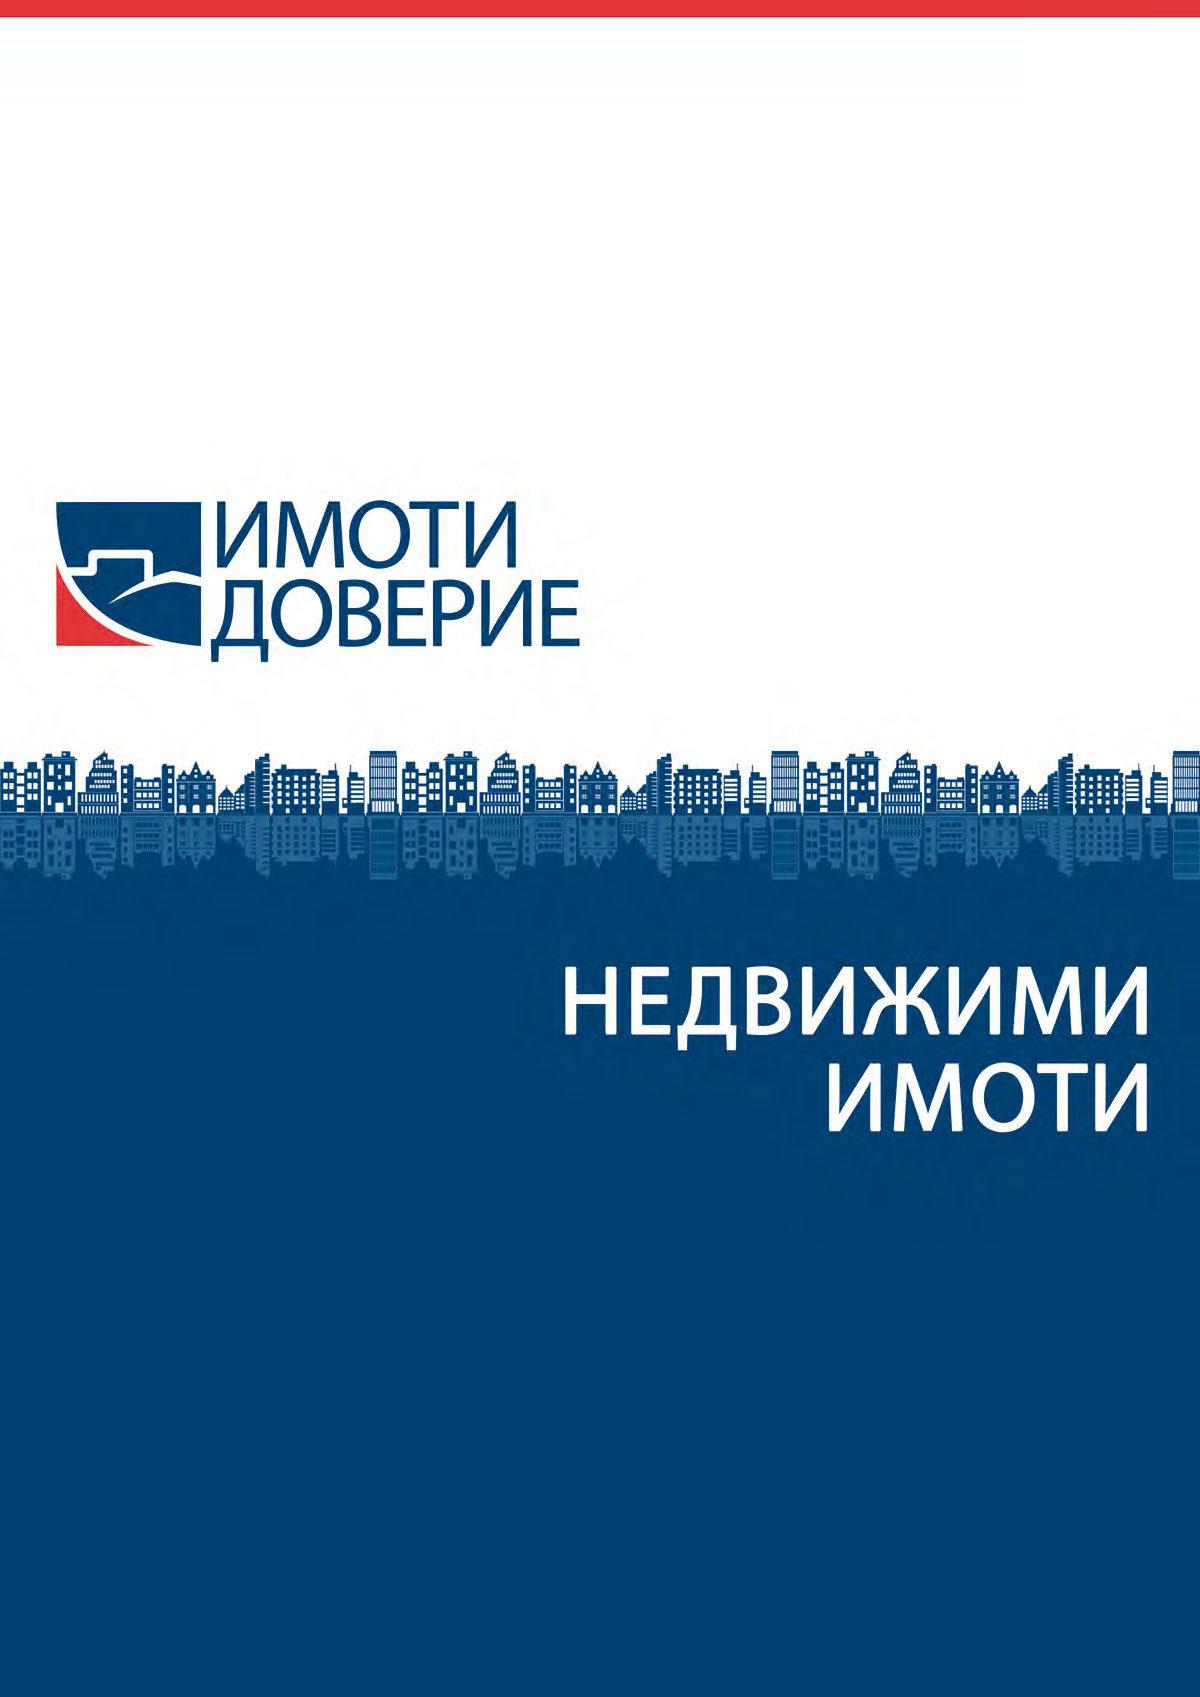 http://www.petkovstudio.com/bg/wp-content/uploads/2013/10/Imoti-Doverie-Predstaviane_Page_1-1200x1697.jpg